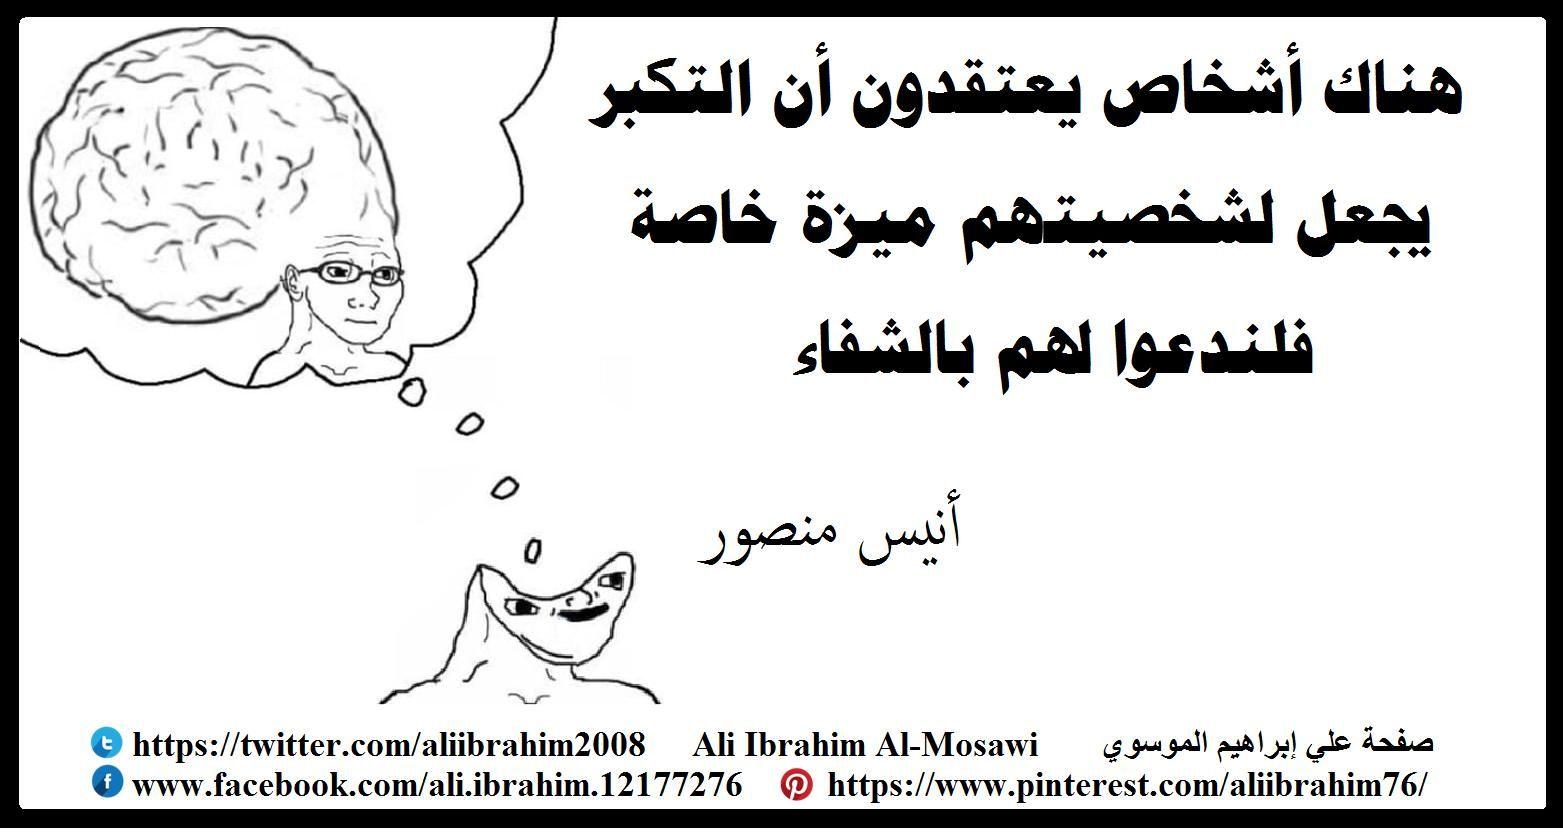 Pin by *** Ali Ibrahim Al-Mosawi علي on خواطر وحكم